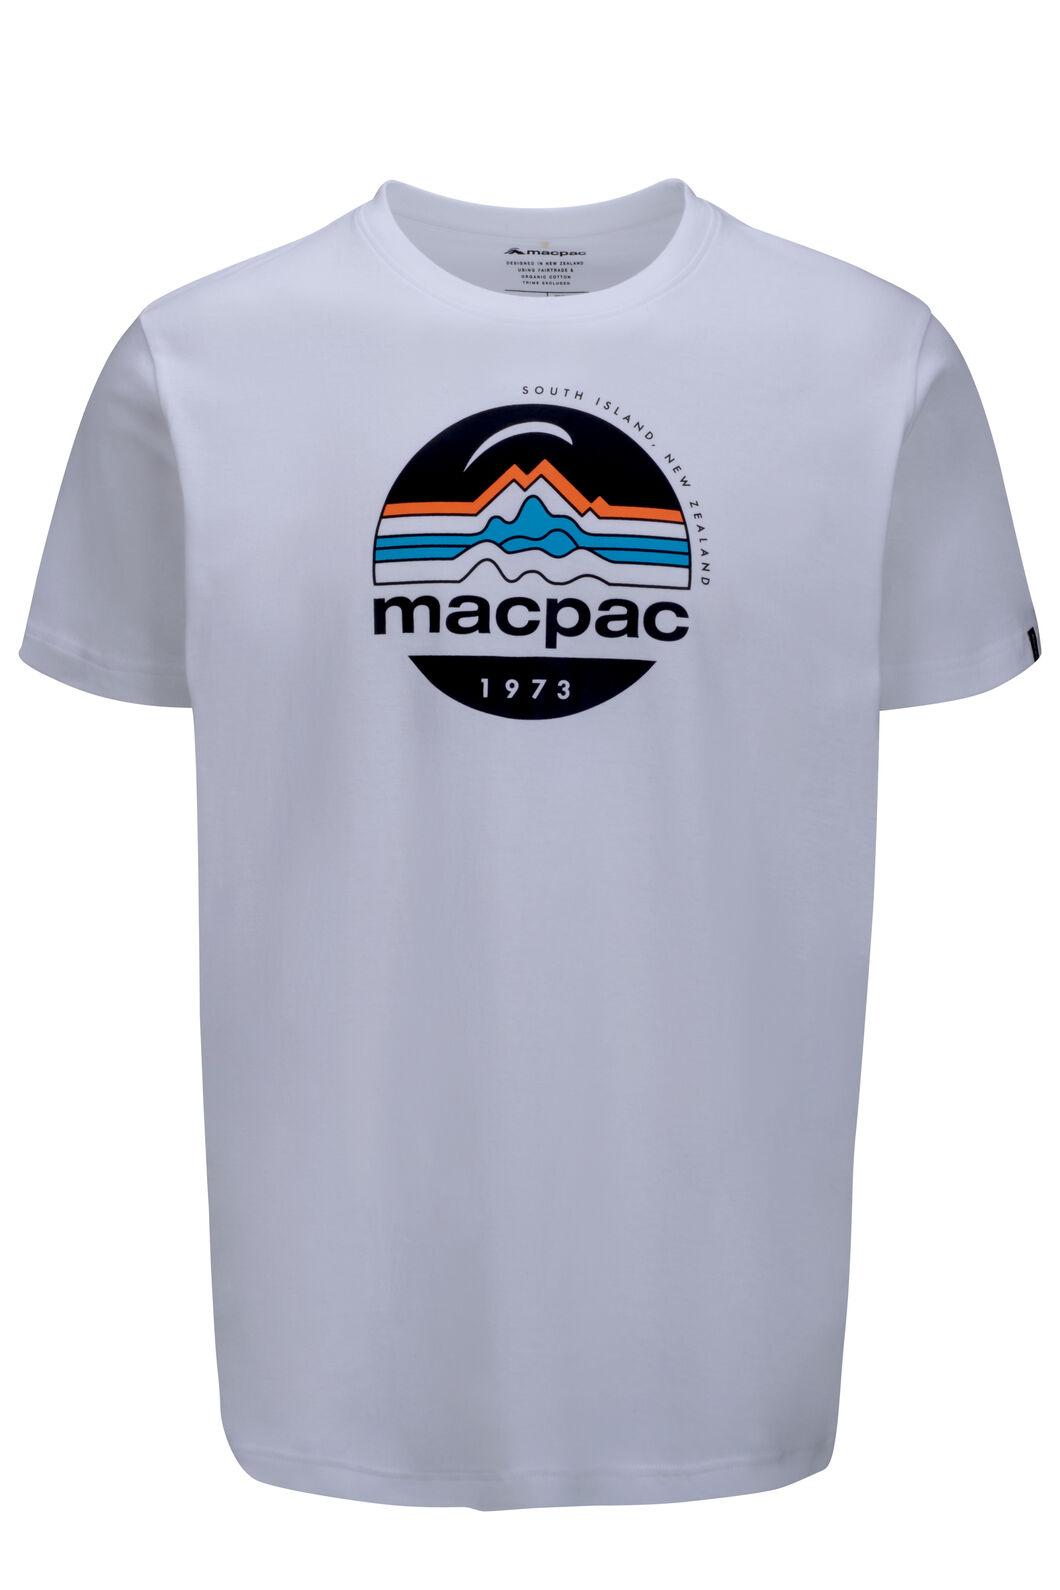 Macpac Retro Fairtrade Organic Cotton Tee — Men's, White, hi-res